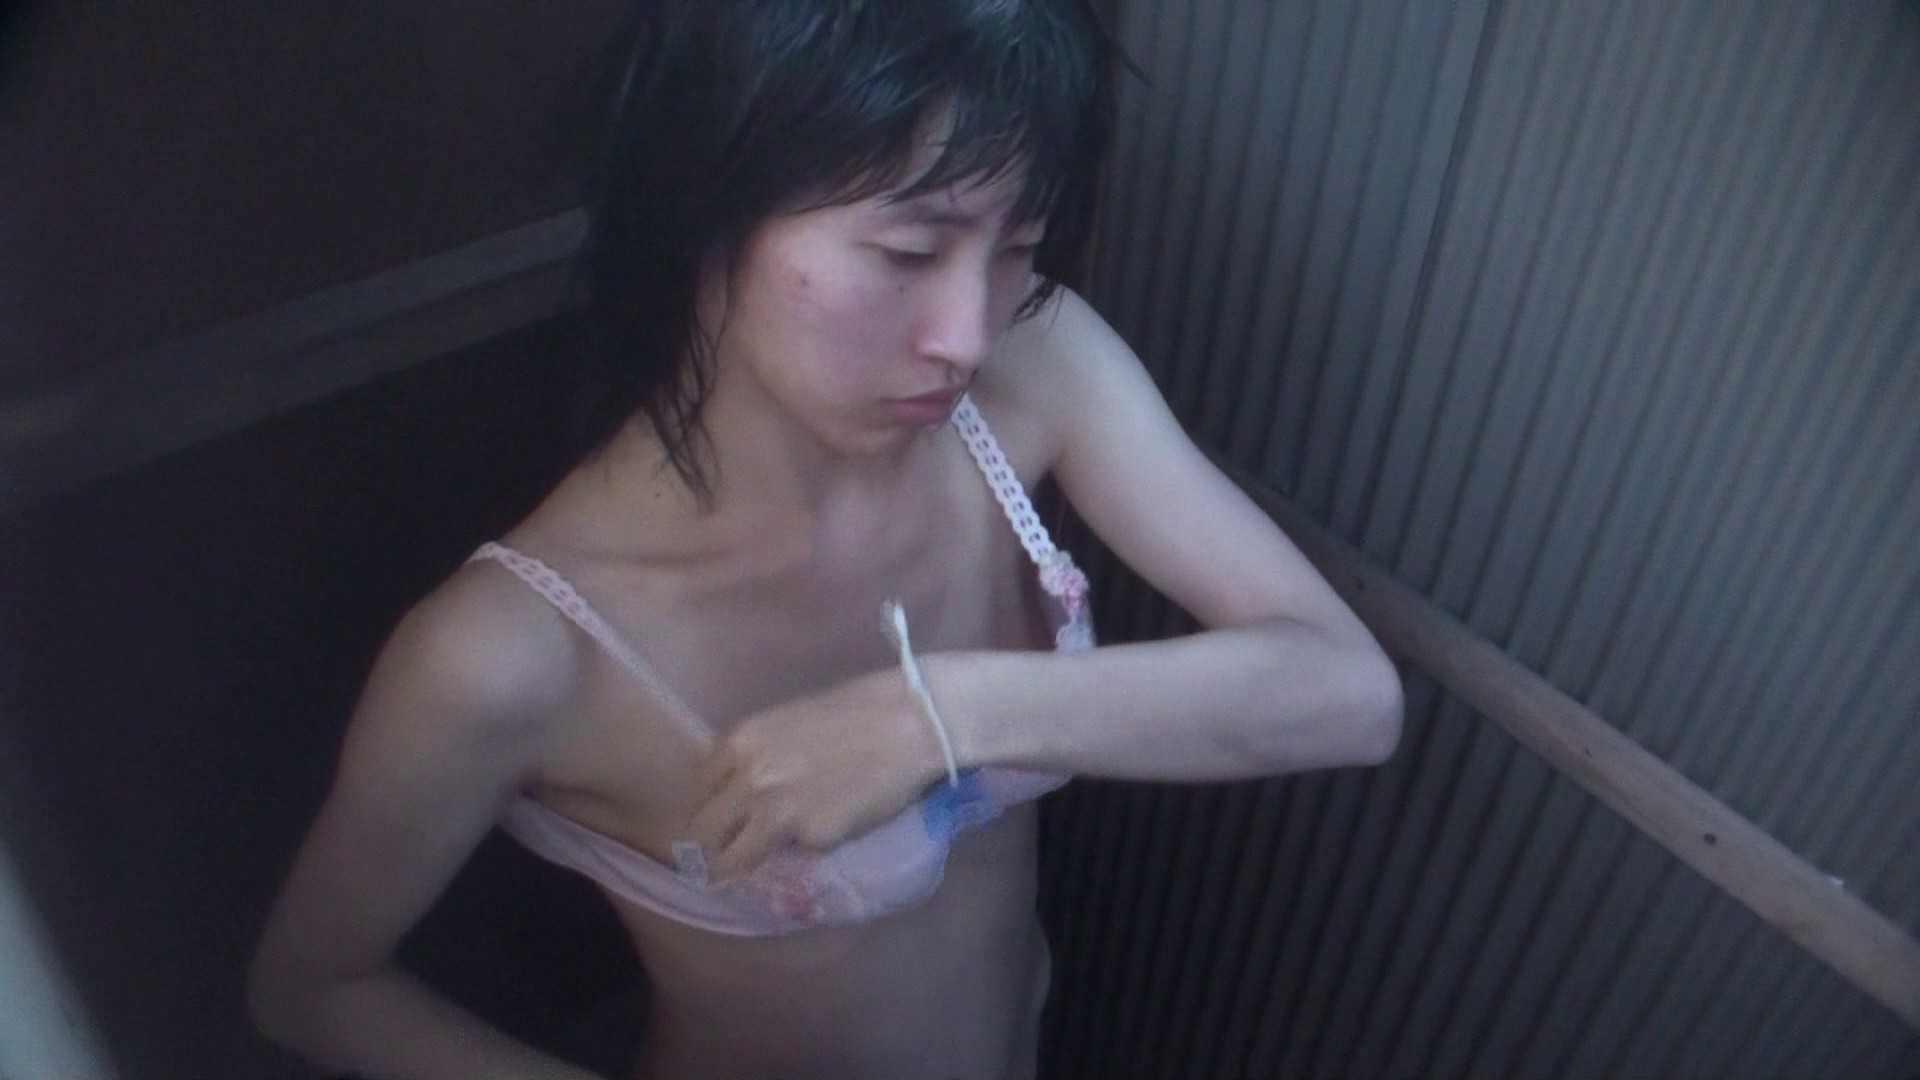 Vol.24 再登場 生理中の年齢不詳嬢 盗撮  110PIX 70